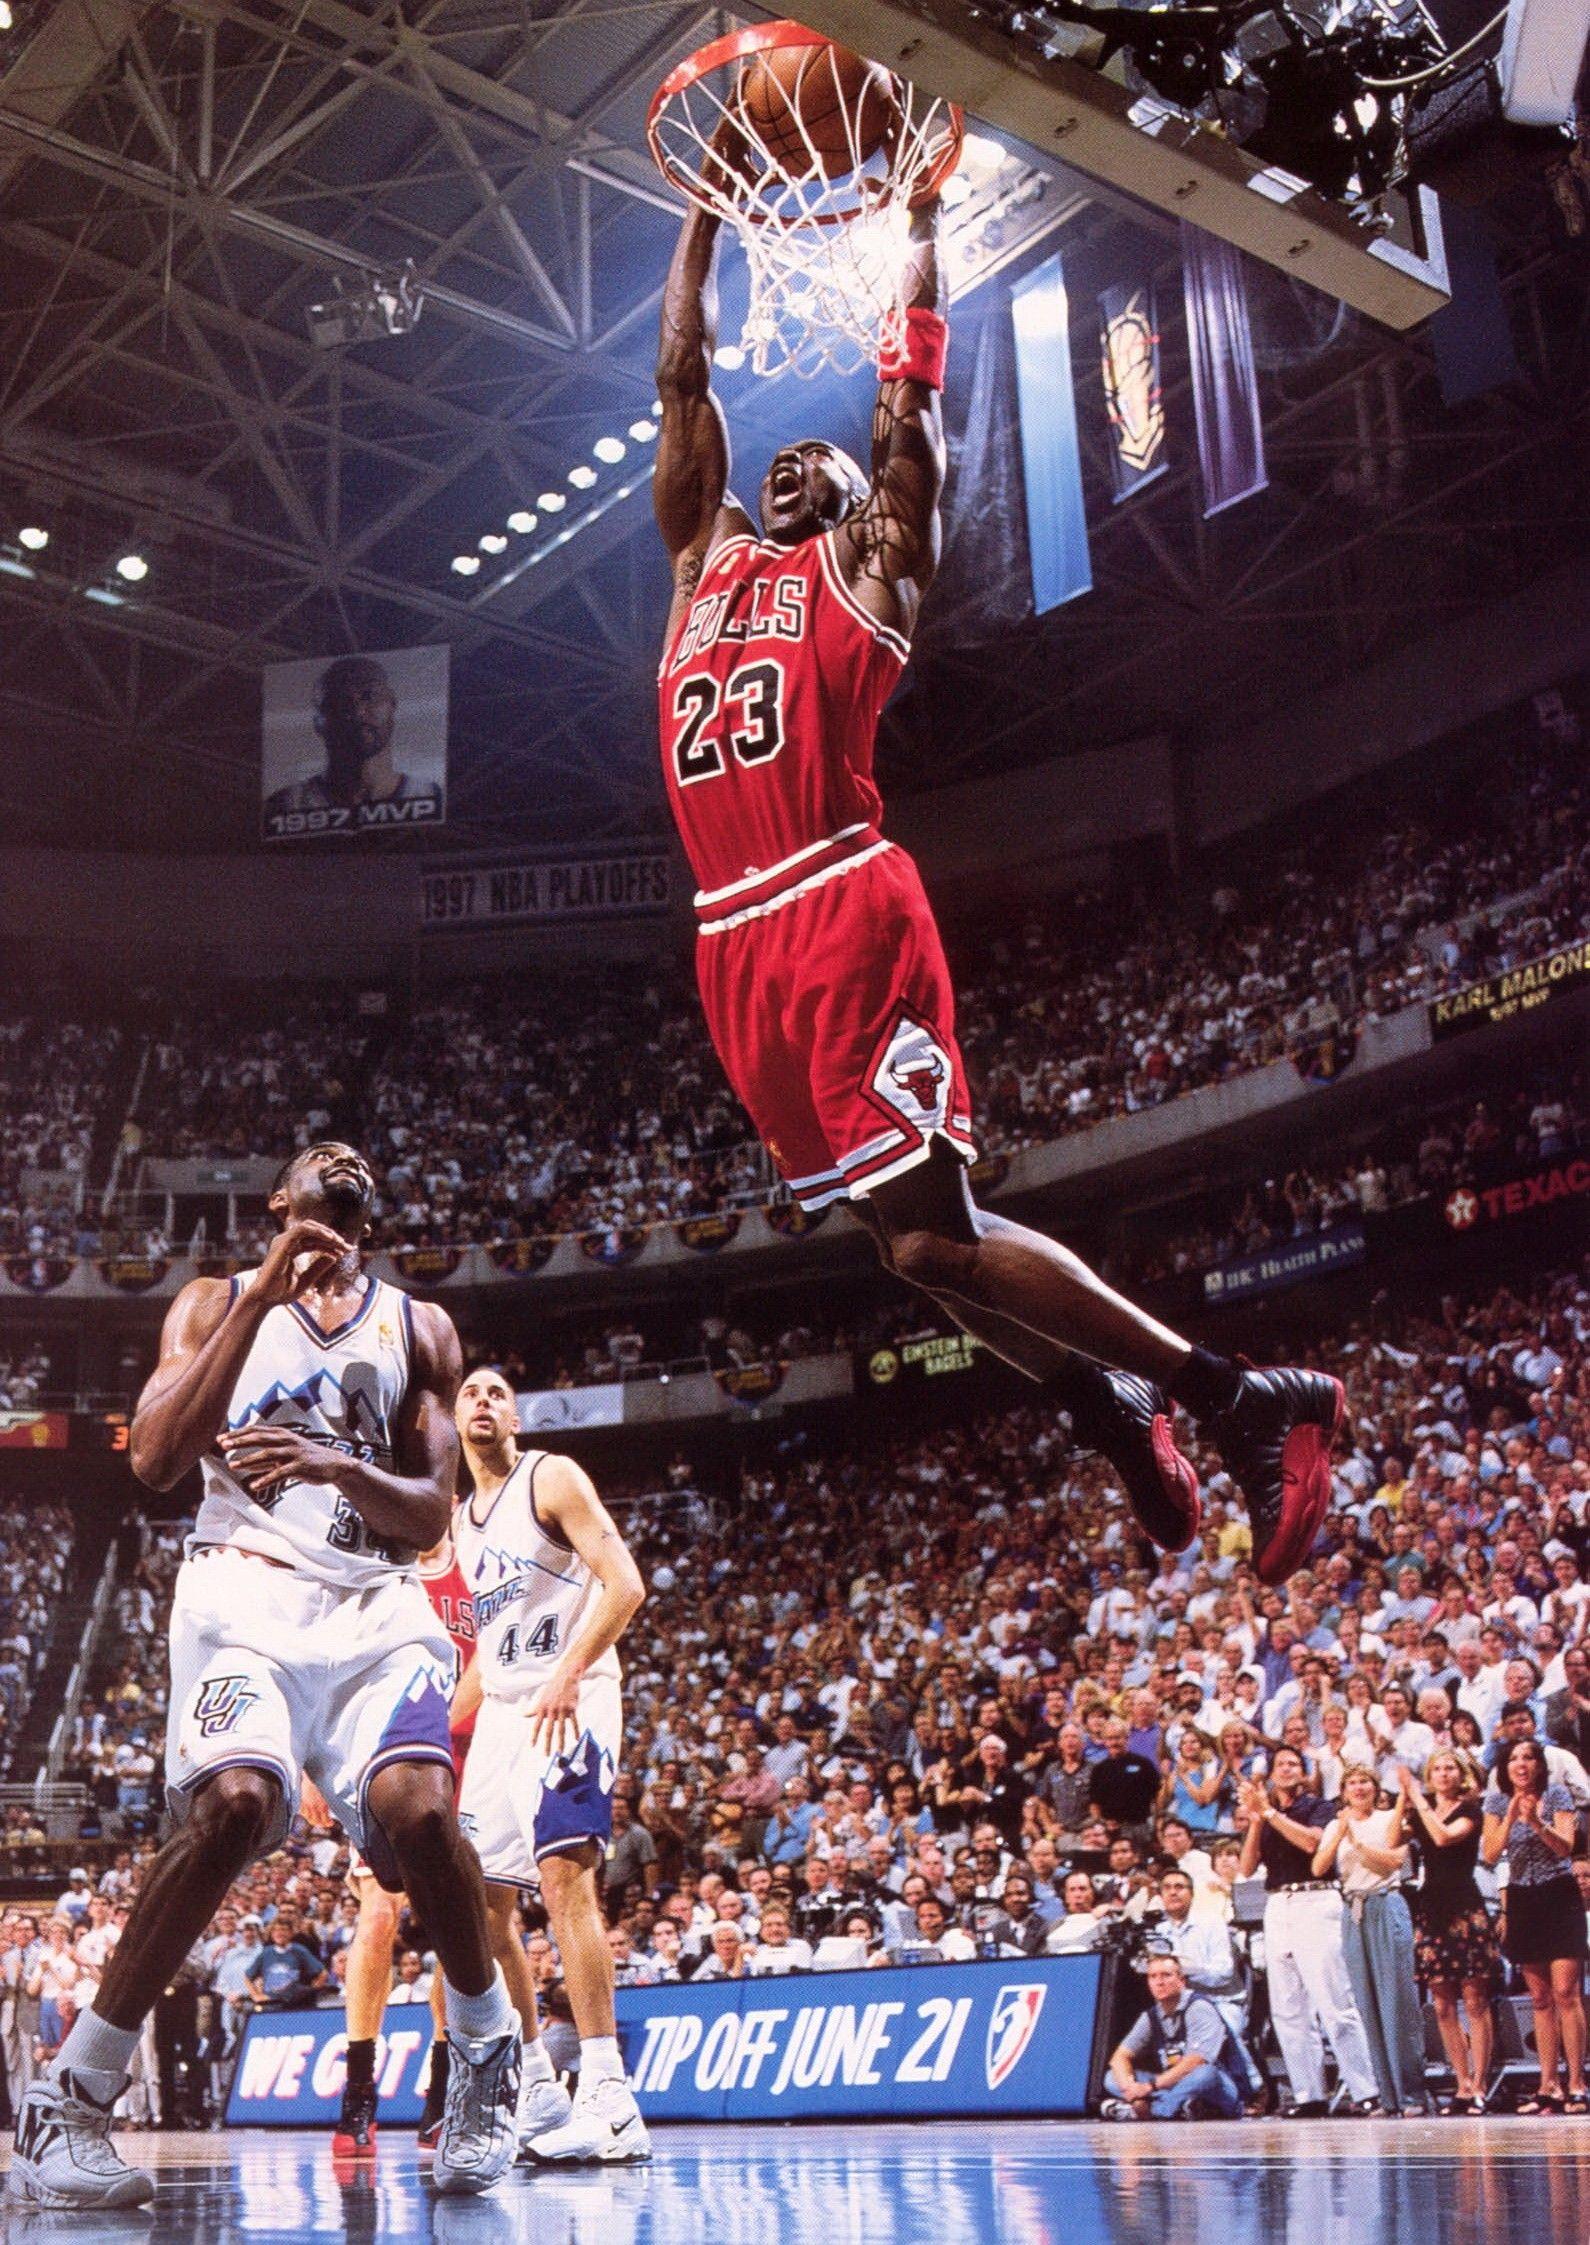 oficjalna strona kup popularne hurtownia online Michael Jordan's mansion available at $8 million discount ...